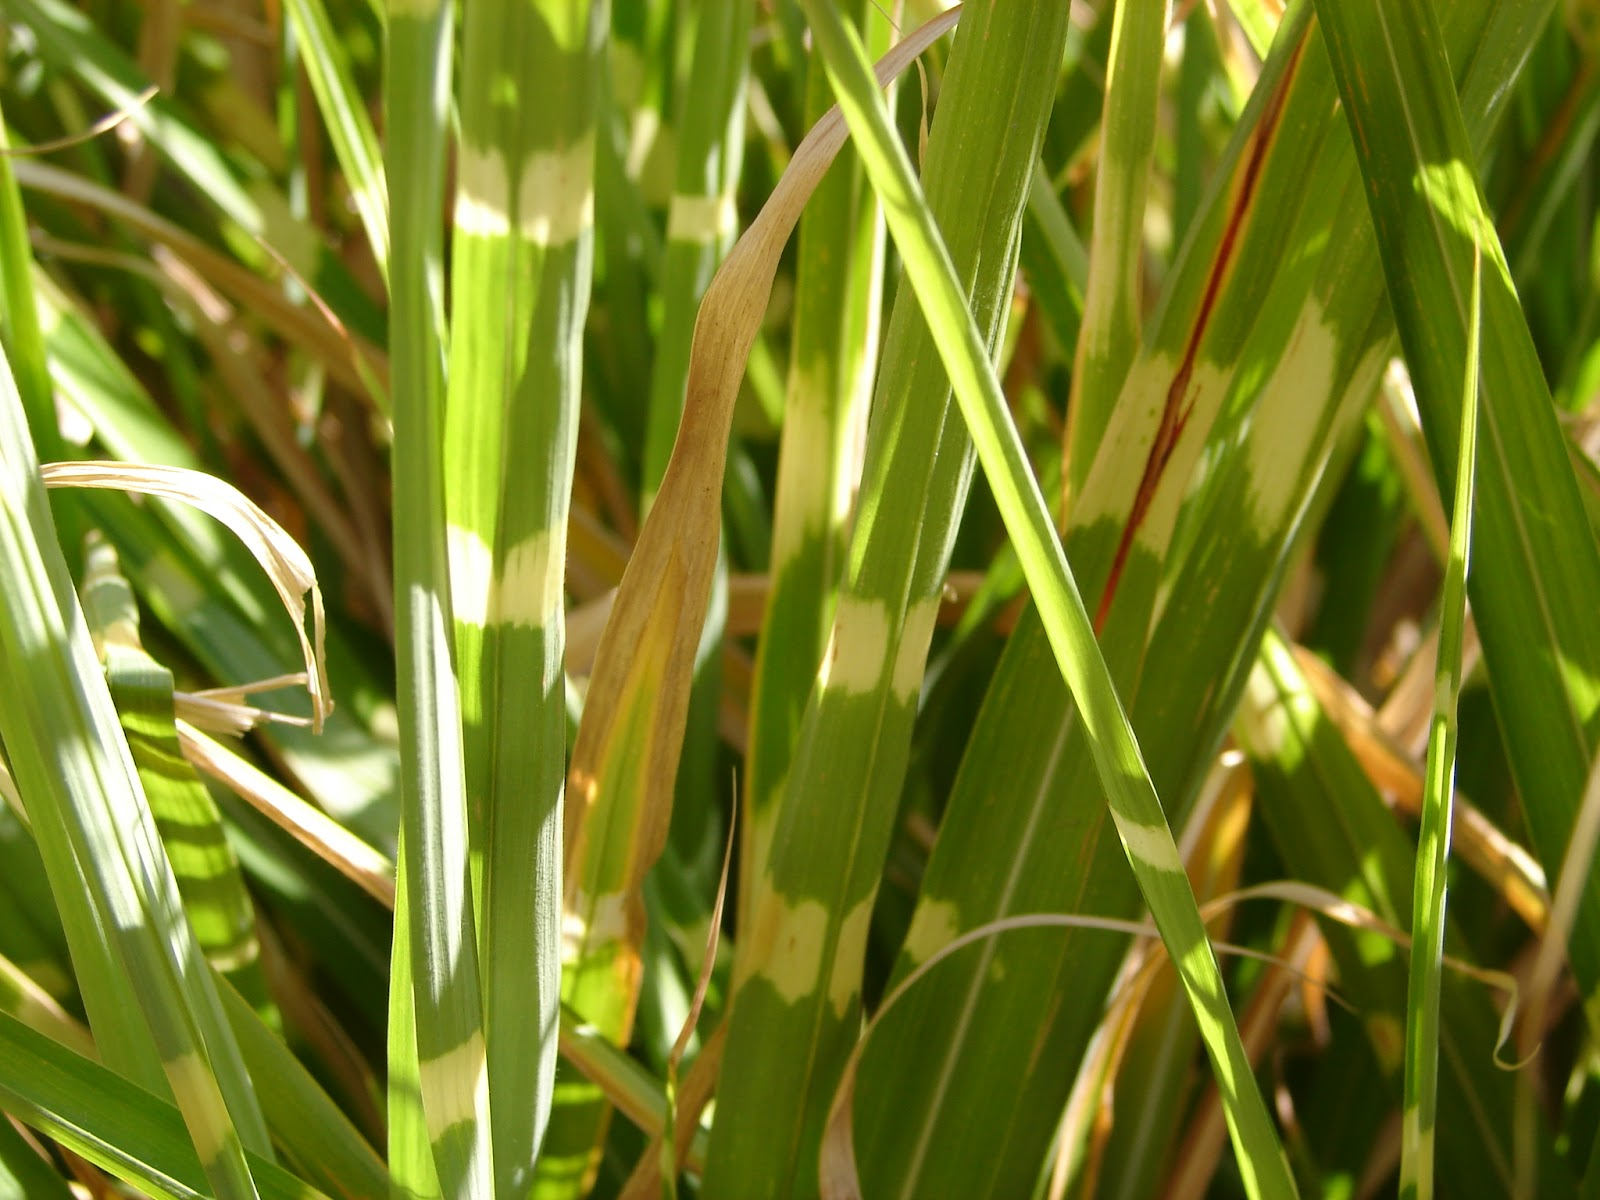 New utah gardener porcupine grass and zebra grass for Yellow ornamental grass